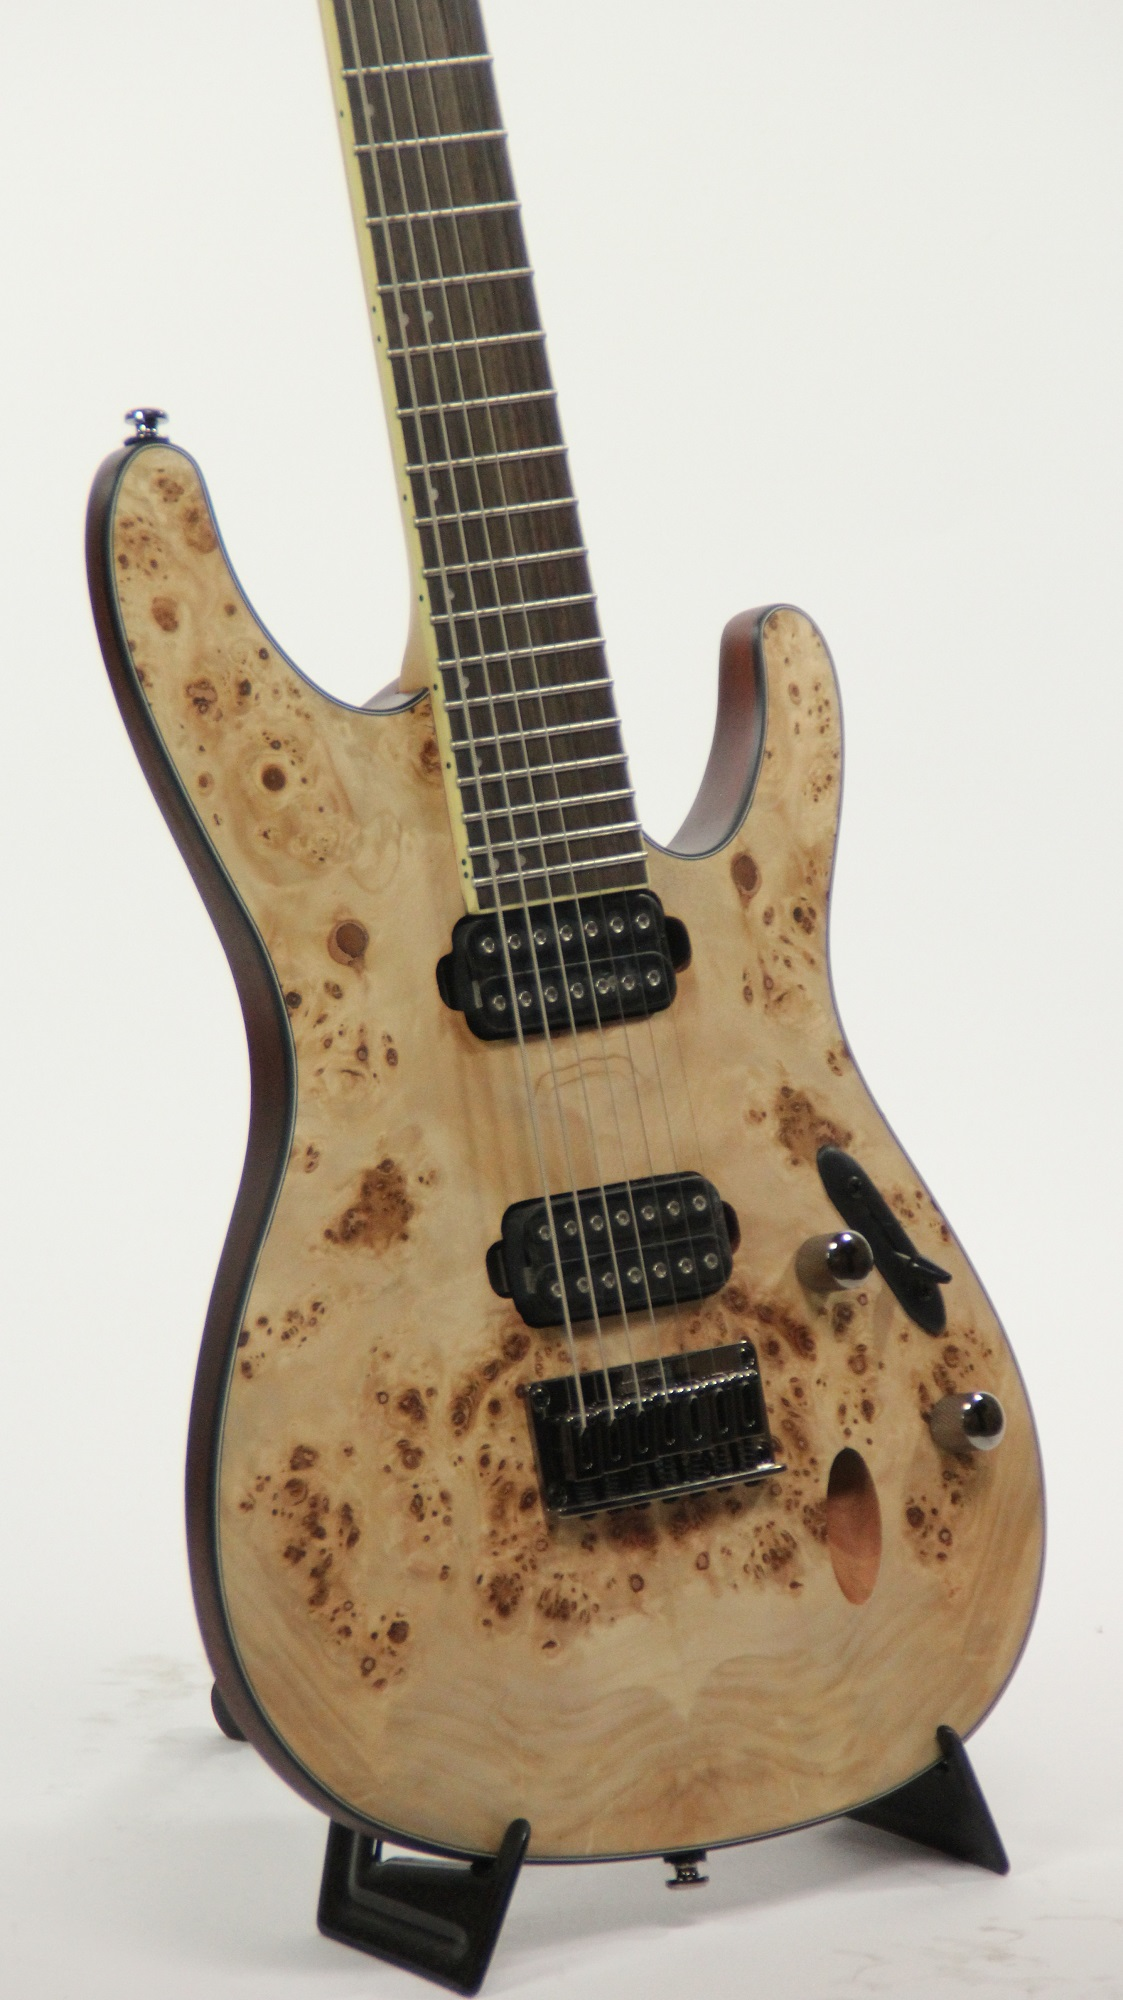 ibanez s7721pb ntf natural flat 7 string electric guitar 6. Black Bedroom Furniture Sets. Home Design Ideas